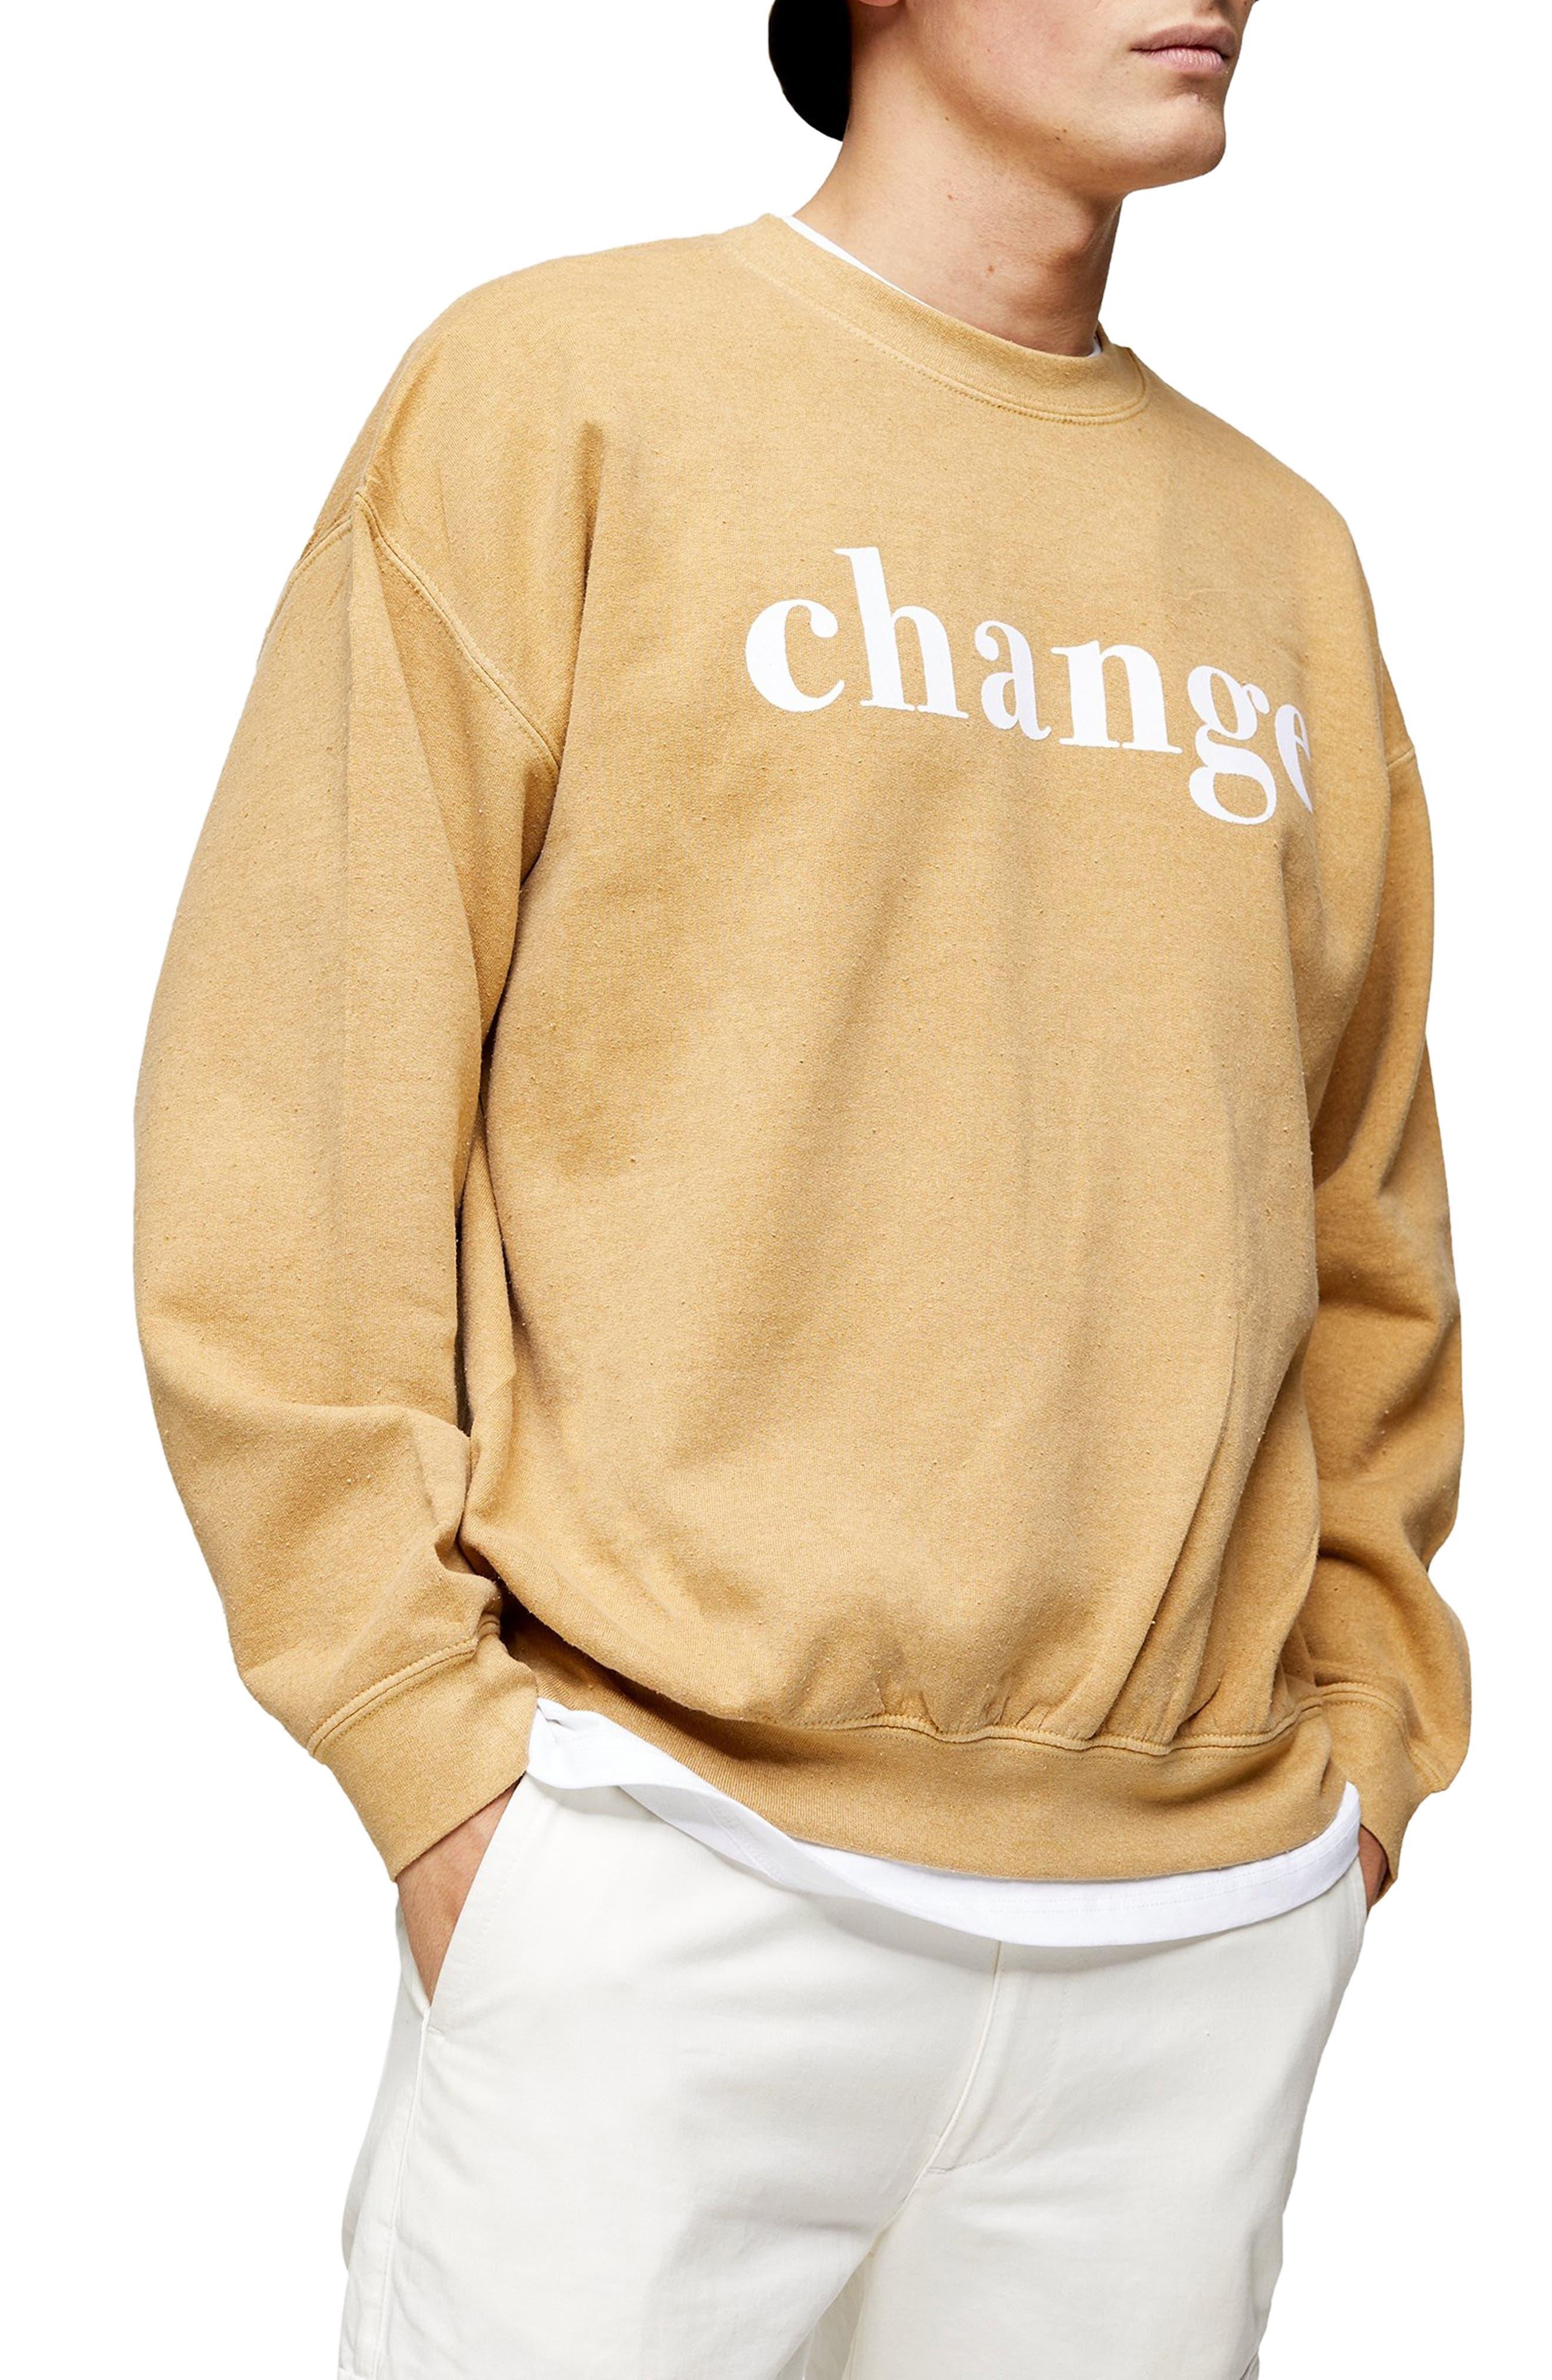 Wofupowga Men Long Sleeve Fashion Henleys Shirts Comfortable Tops T-Shirt